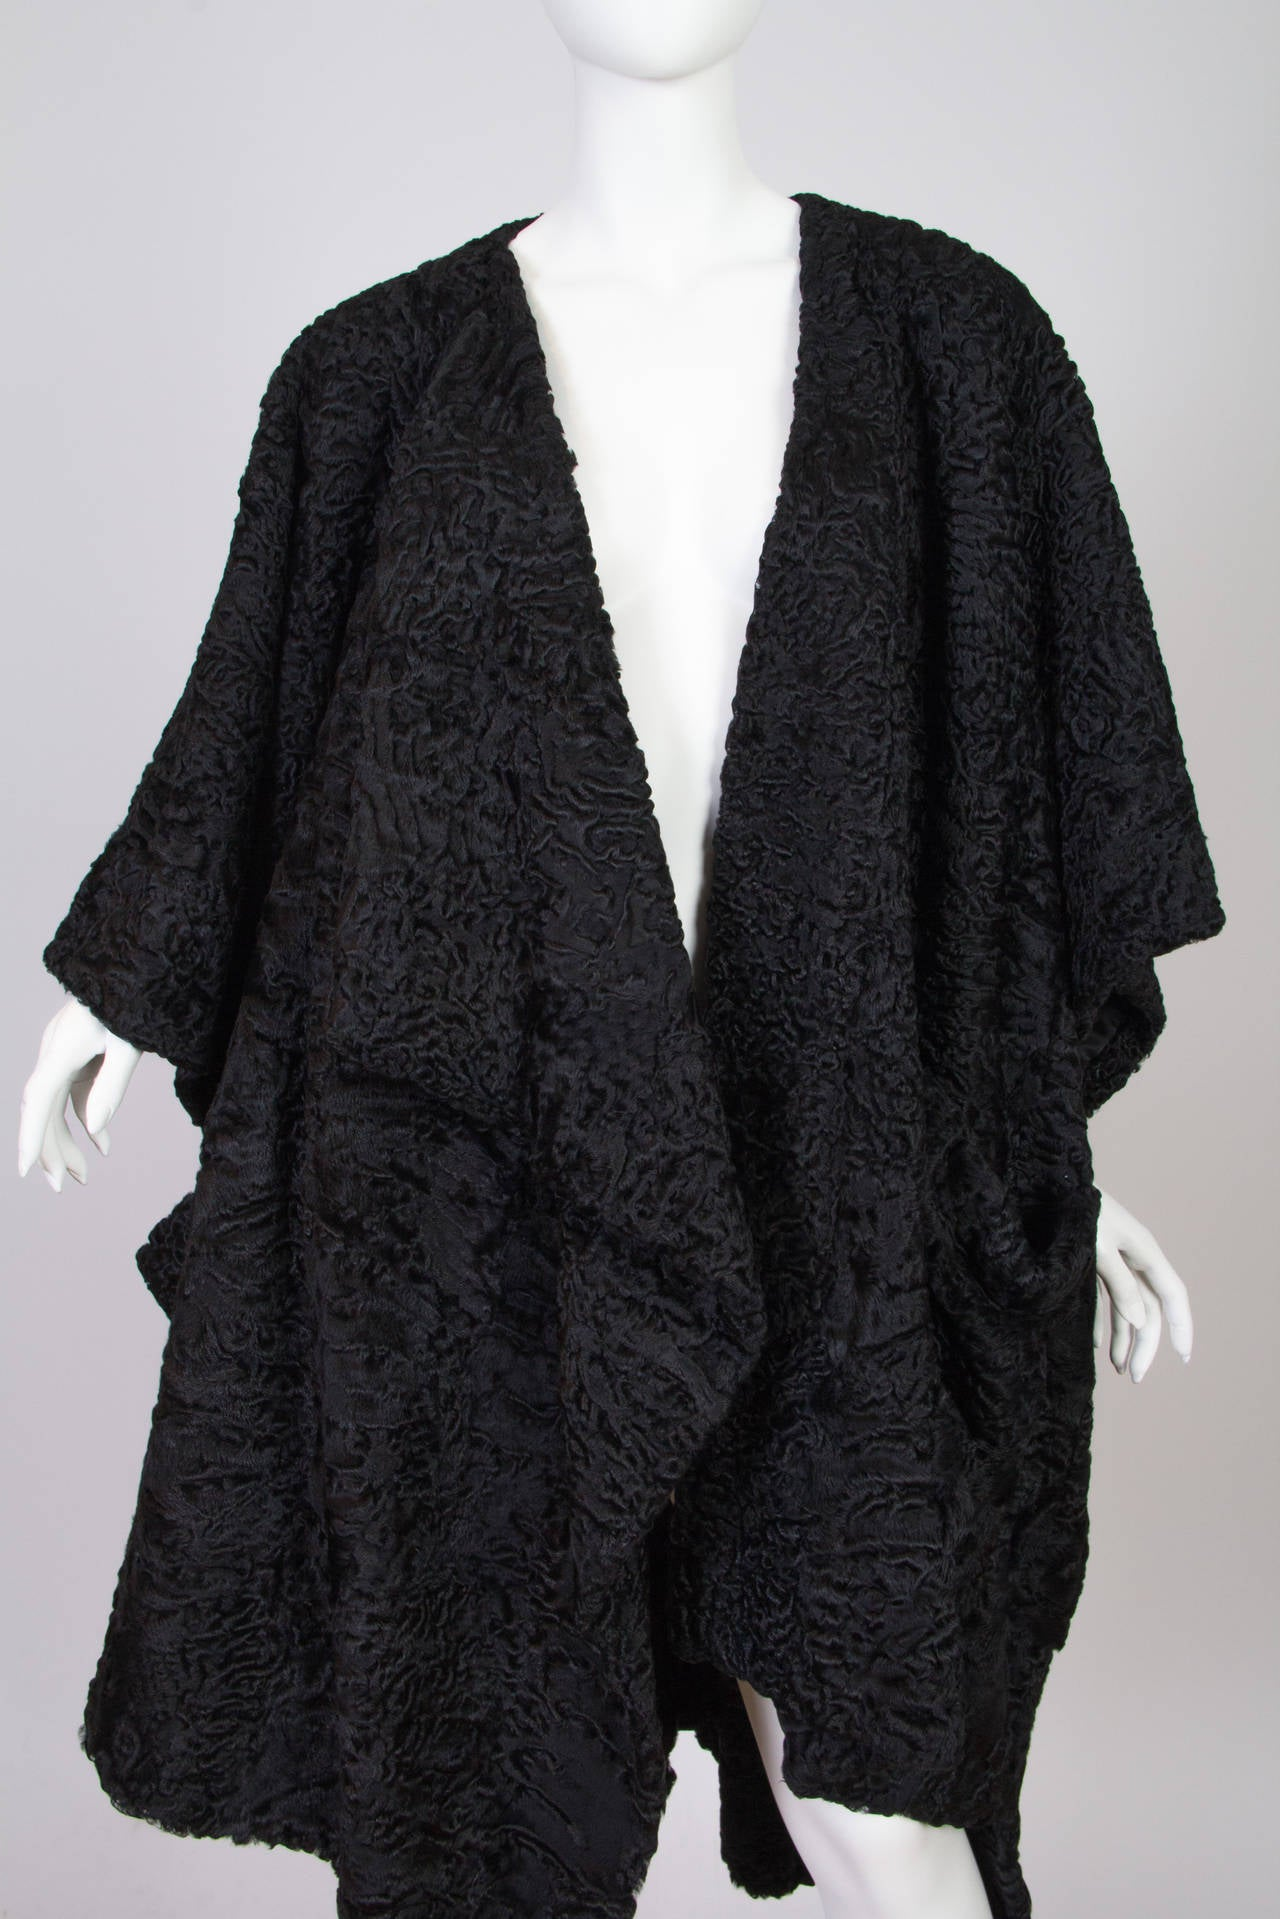 Patrick Kelly Asymetrical Minimalist Black Astrakhan Fur Coat 6